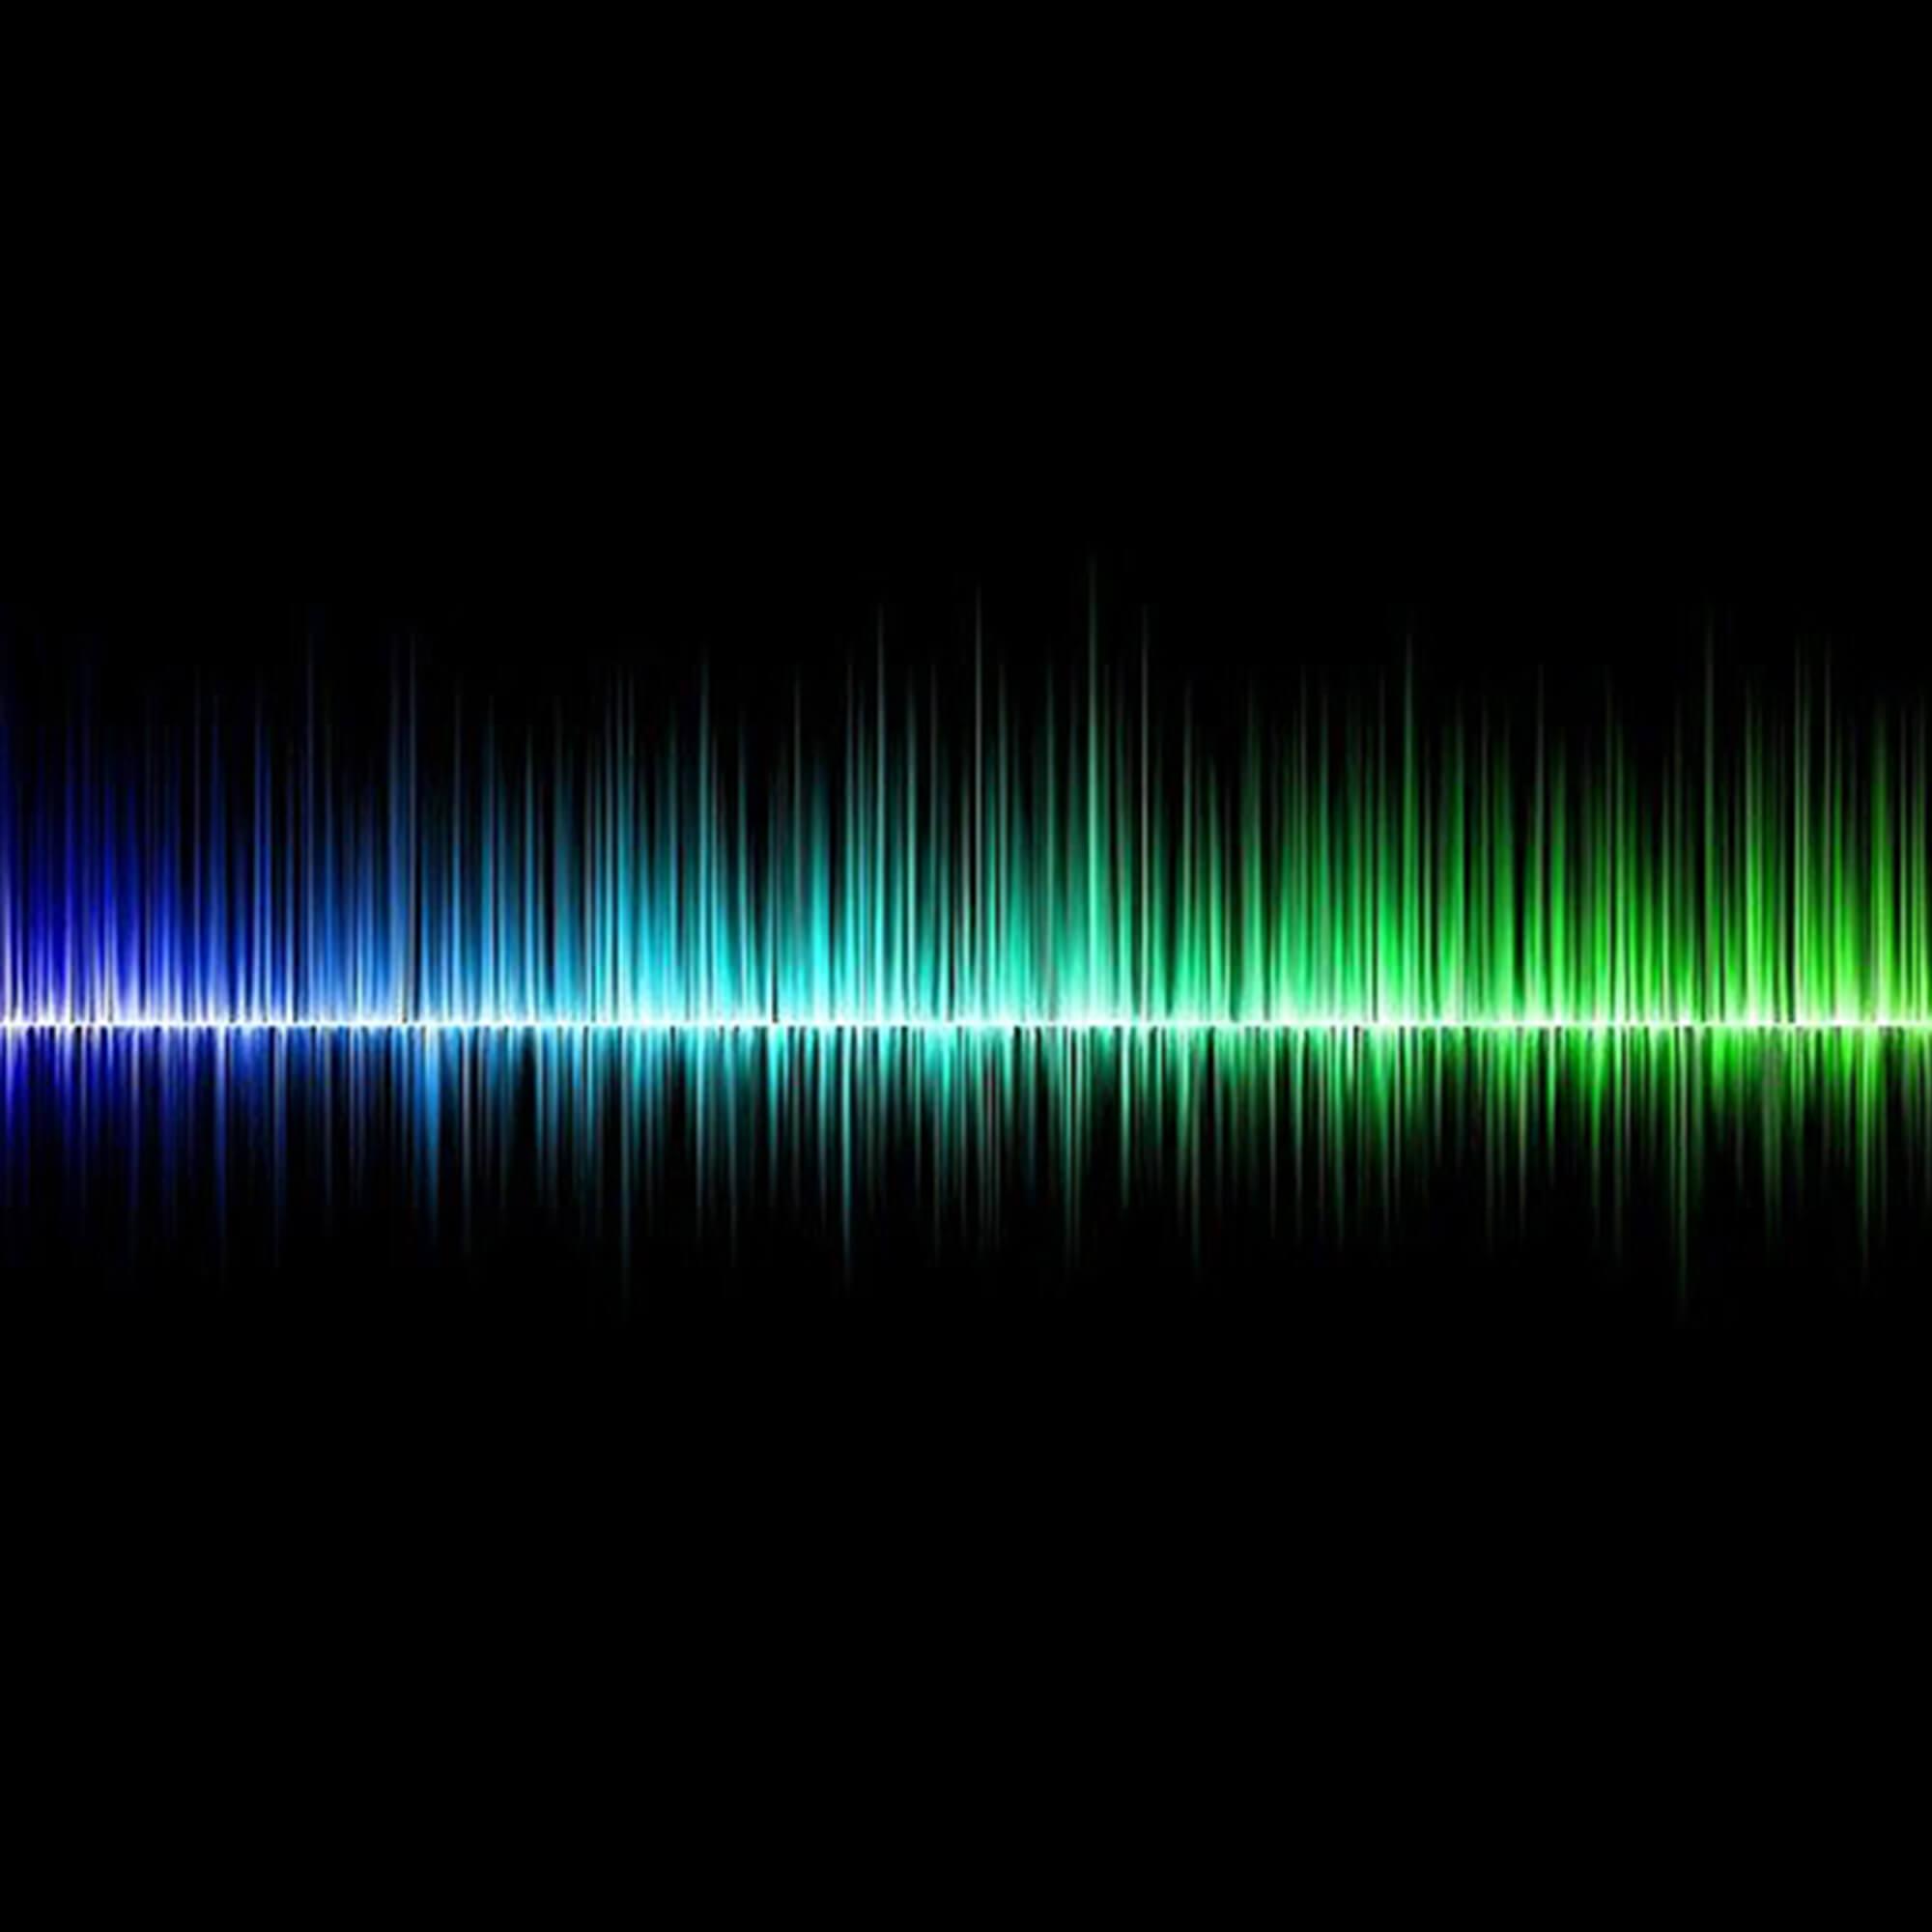 coloured sound waves on a black background